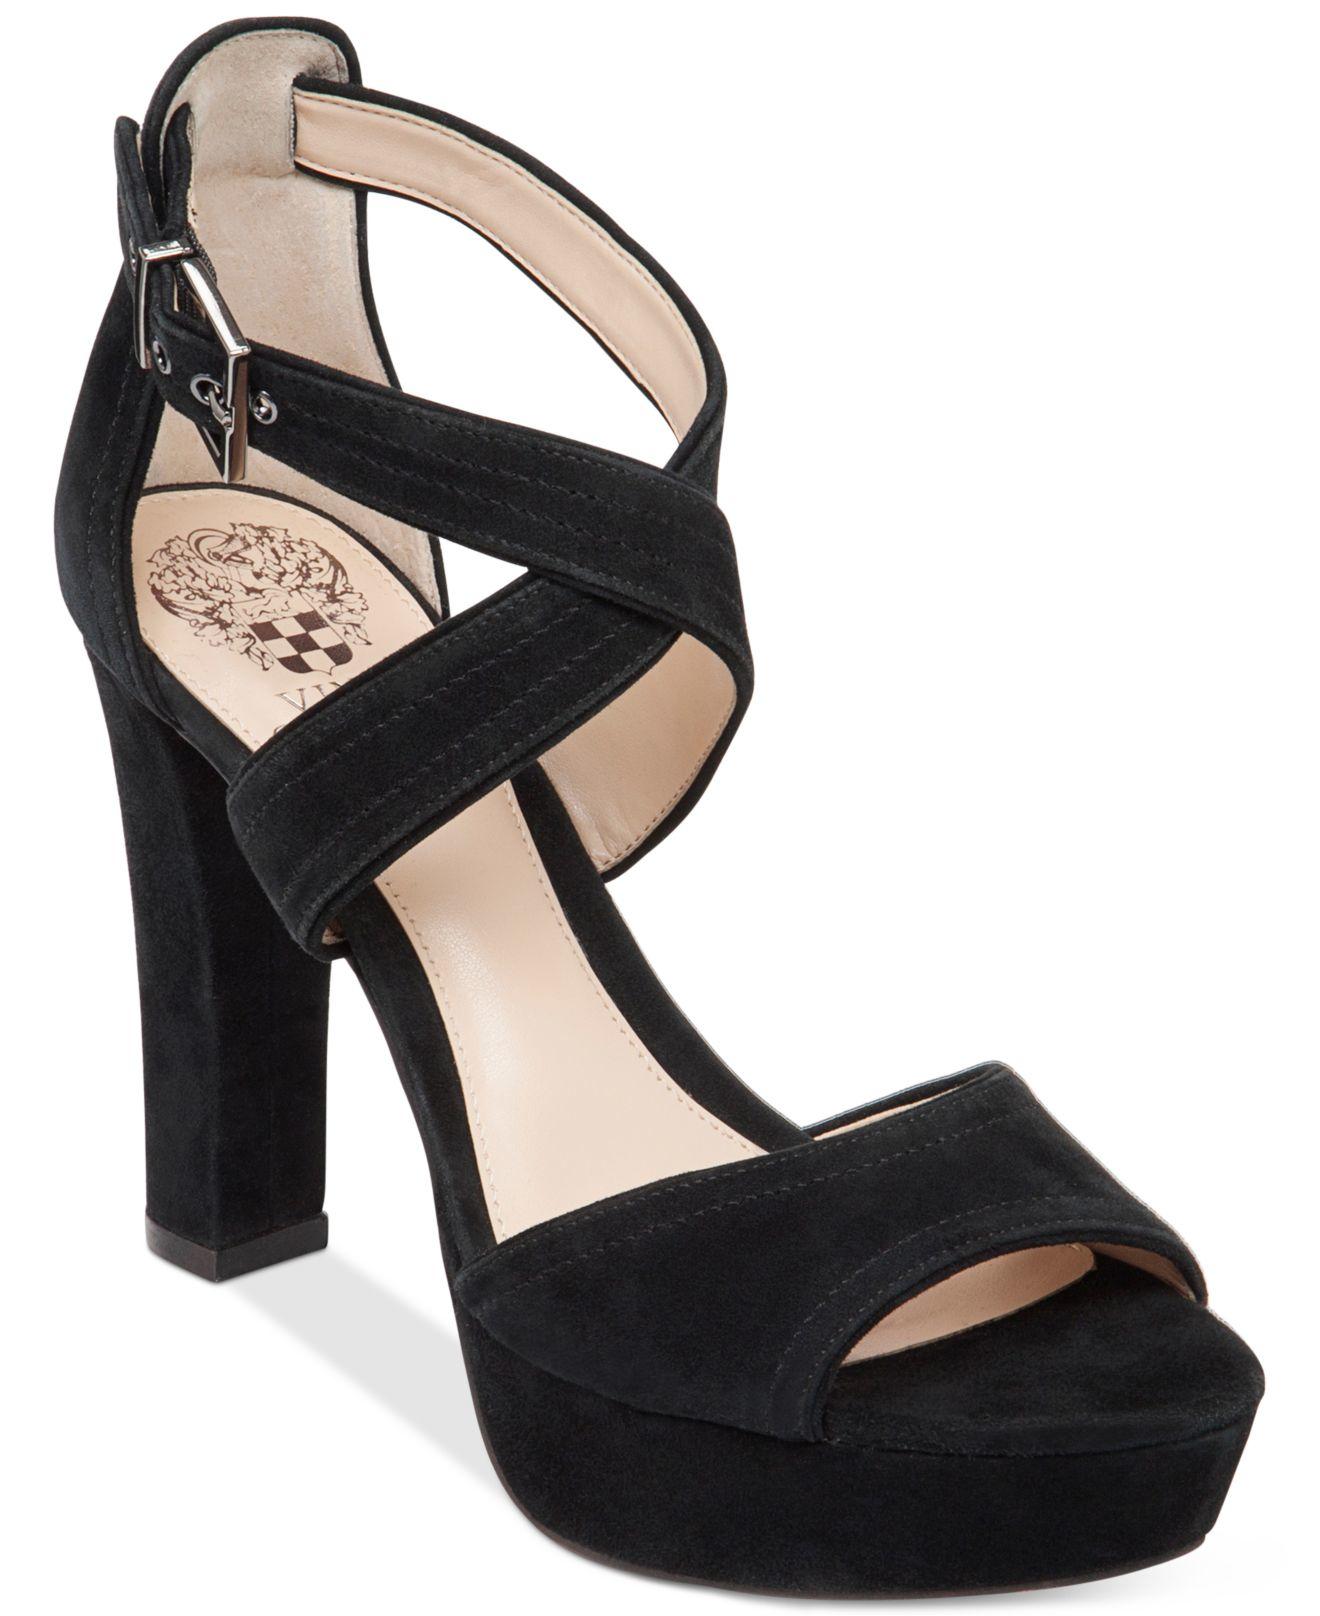 Vince Camuto Shayla Platform Sandals In Black Lyst